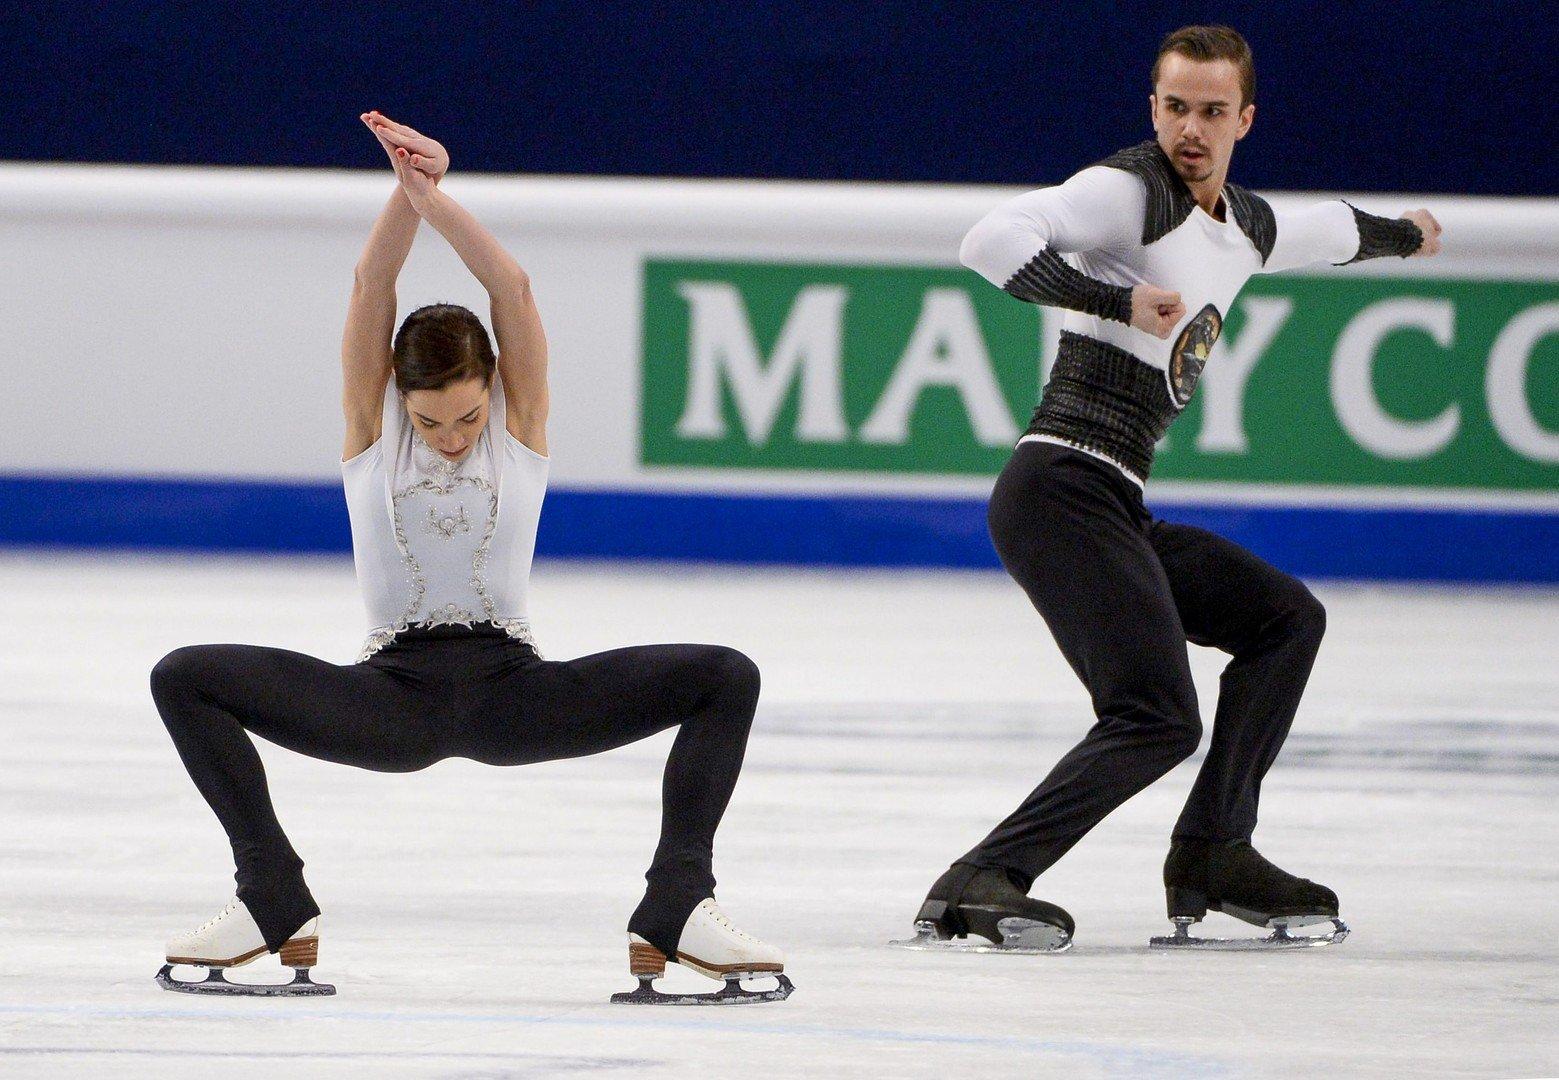 La Russie survole l'Euro 2015 de patinage artistique